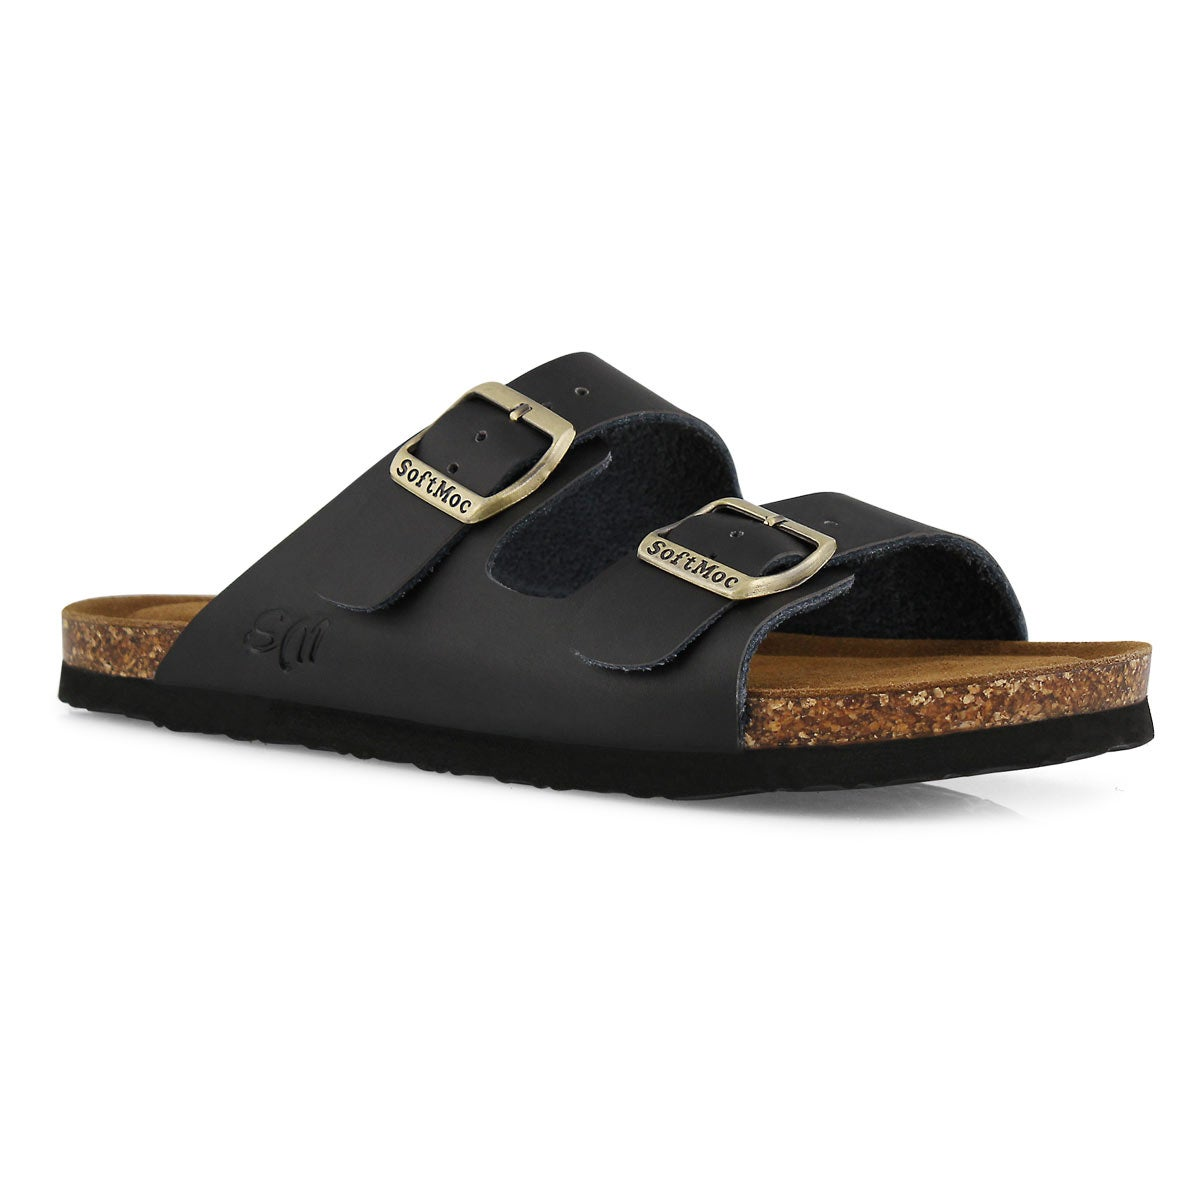 Lds Anna Slim black slide sandal